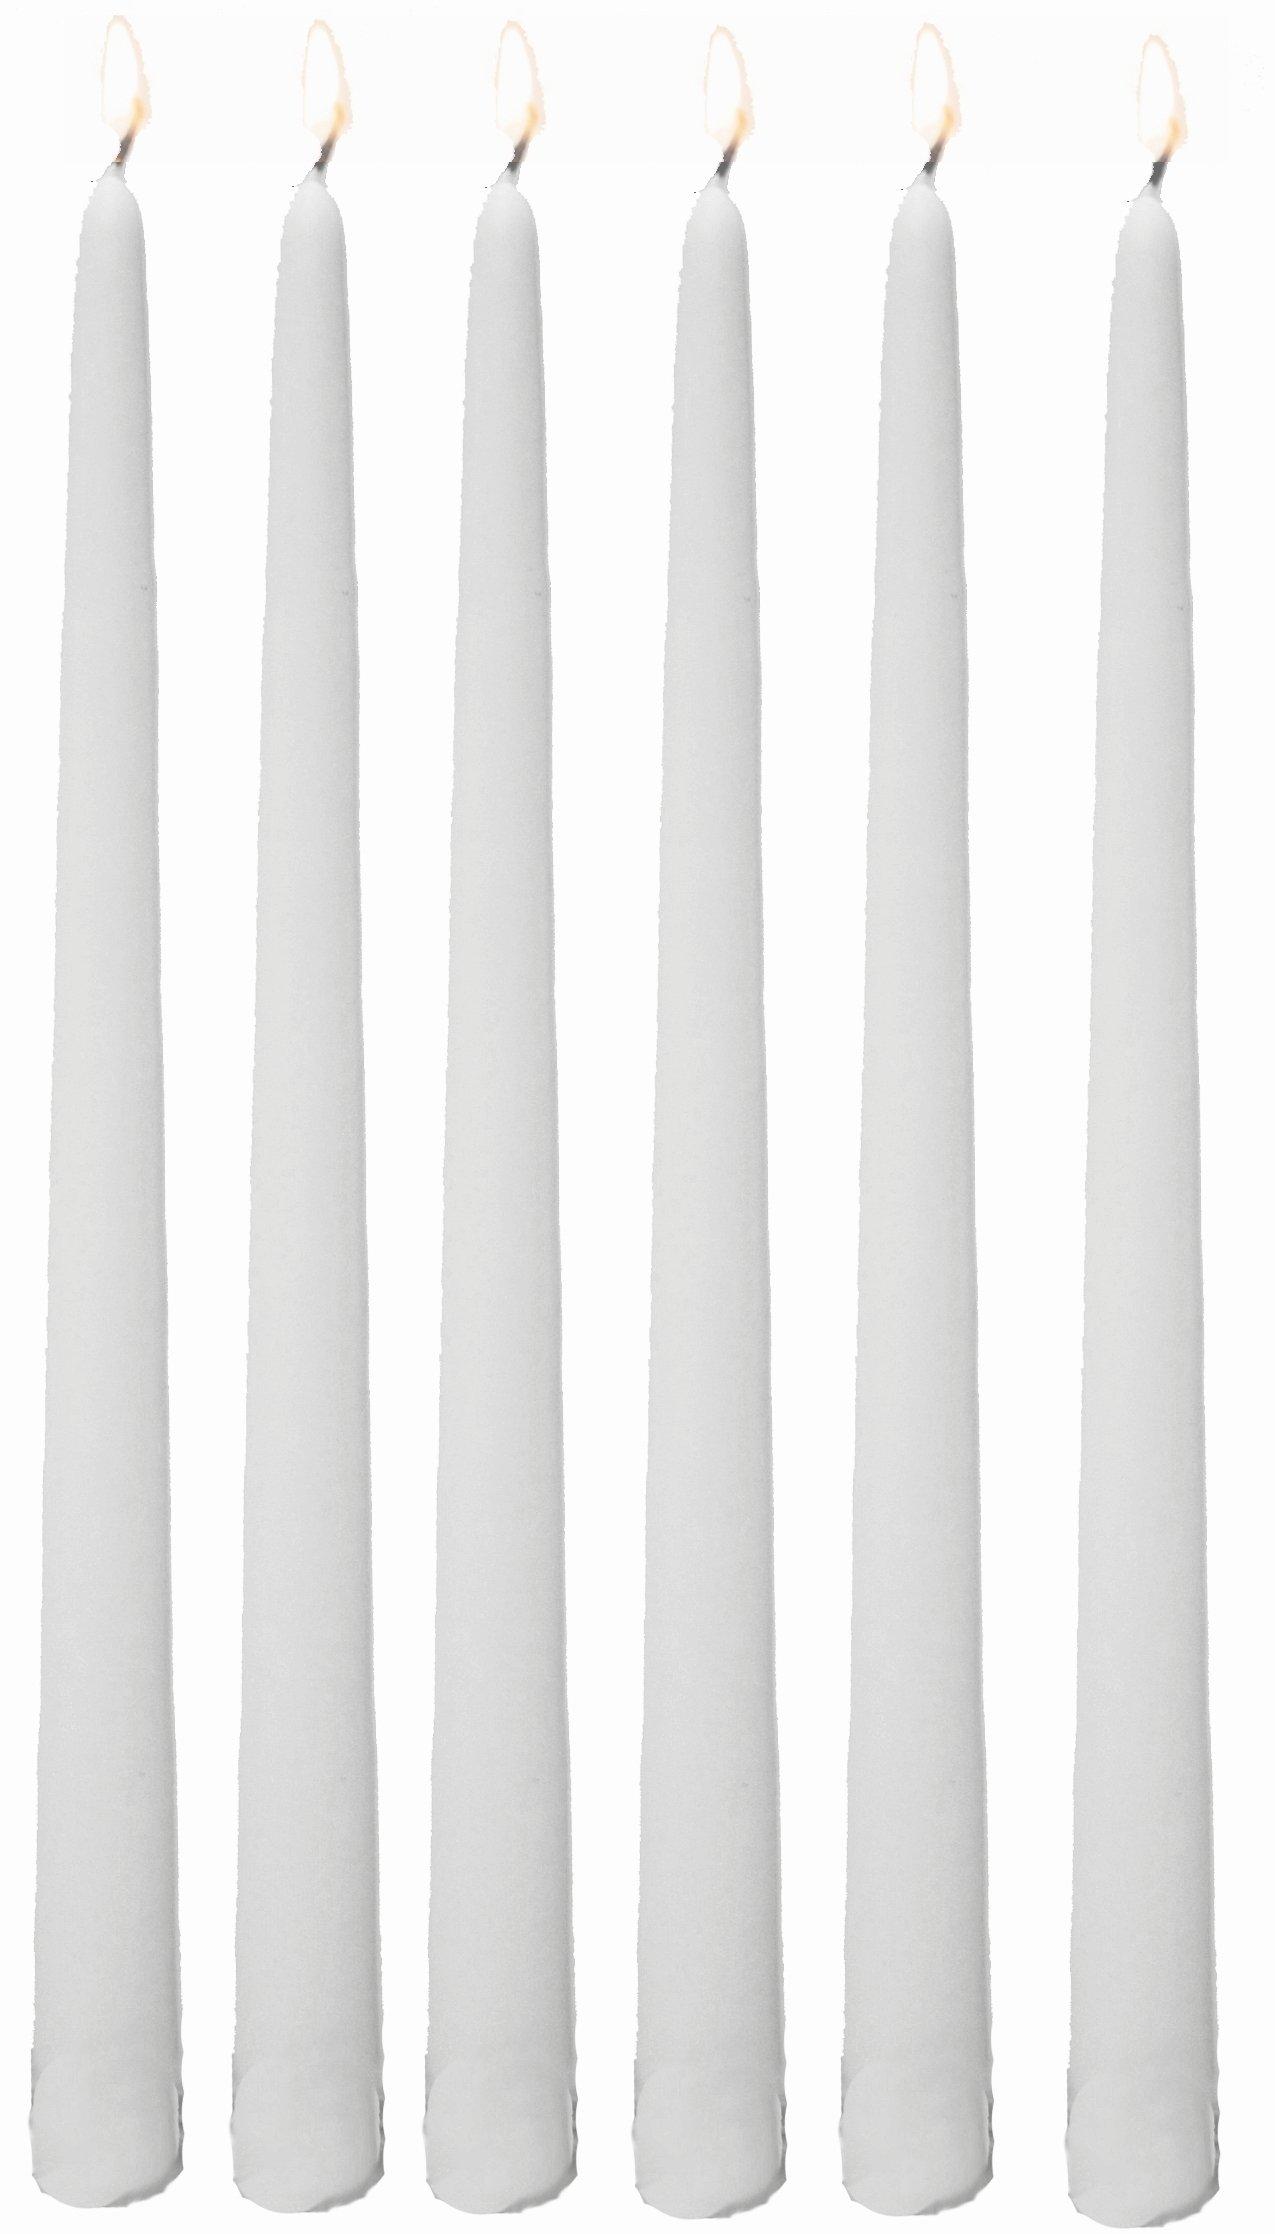 Bulk Taper Candles - Qty 144 (12 Inch, White)